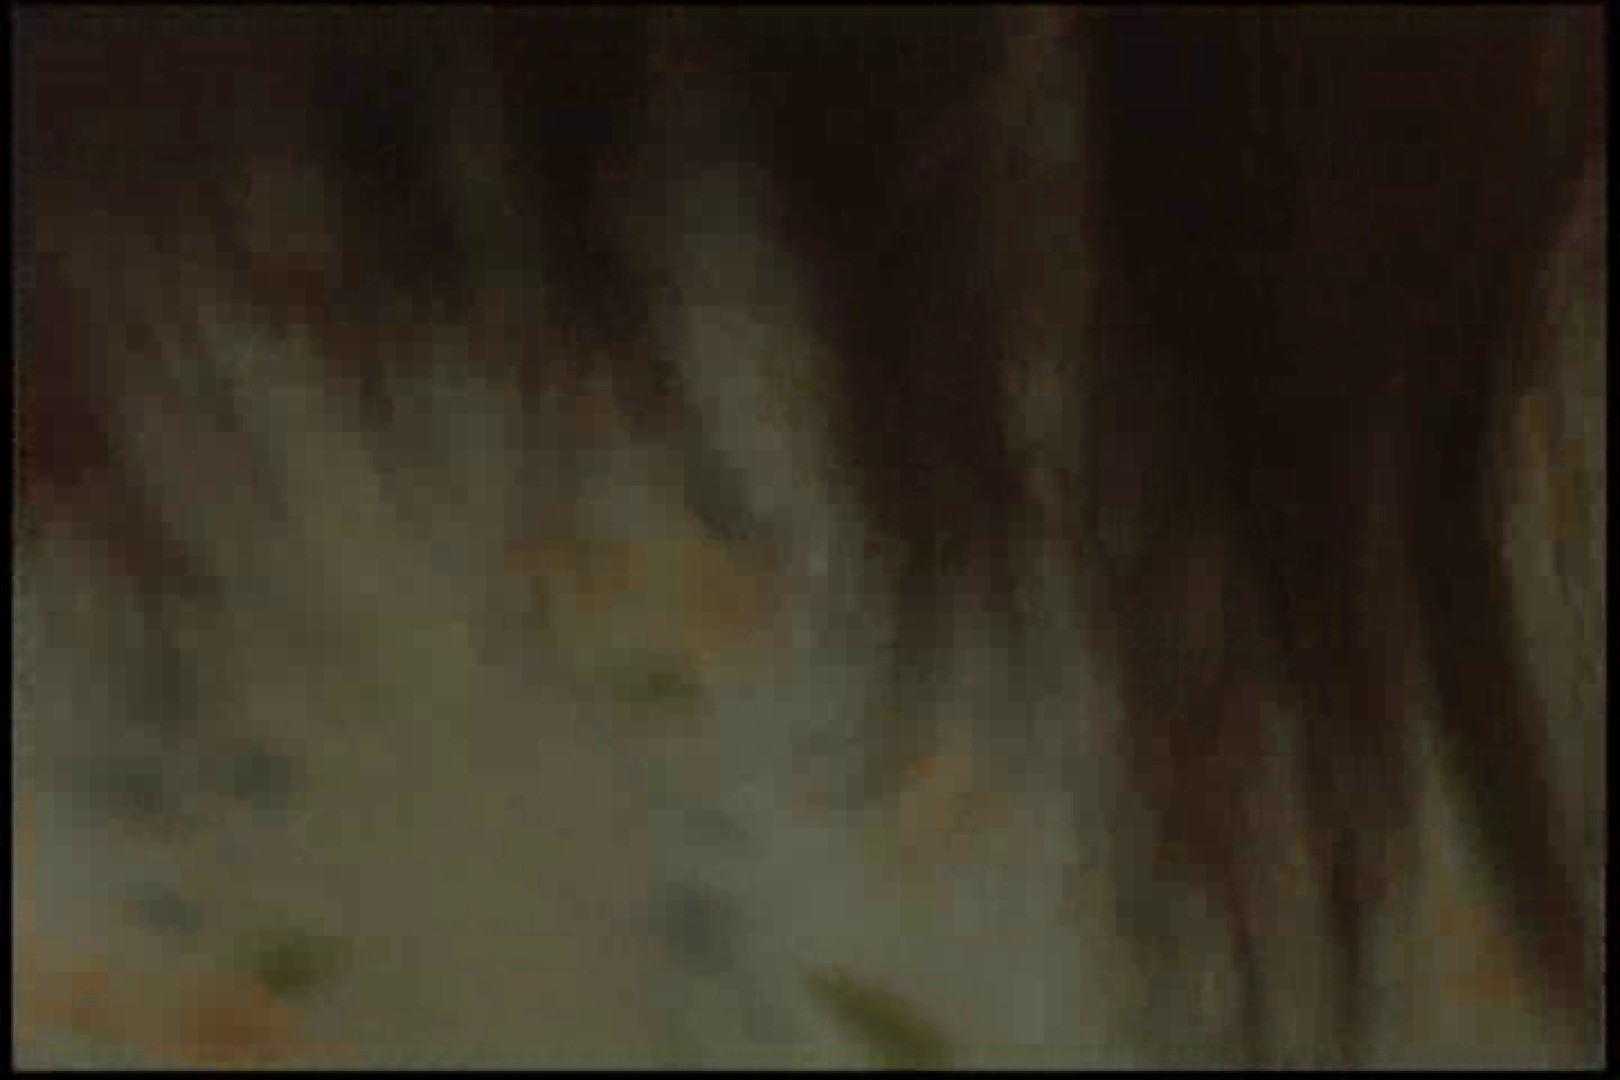 Hなフェロモン漂わせまくりな美人妻 佐々木薫子 悶え声 ワレメ無修正動画無料 73pic 35